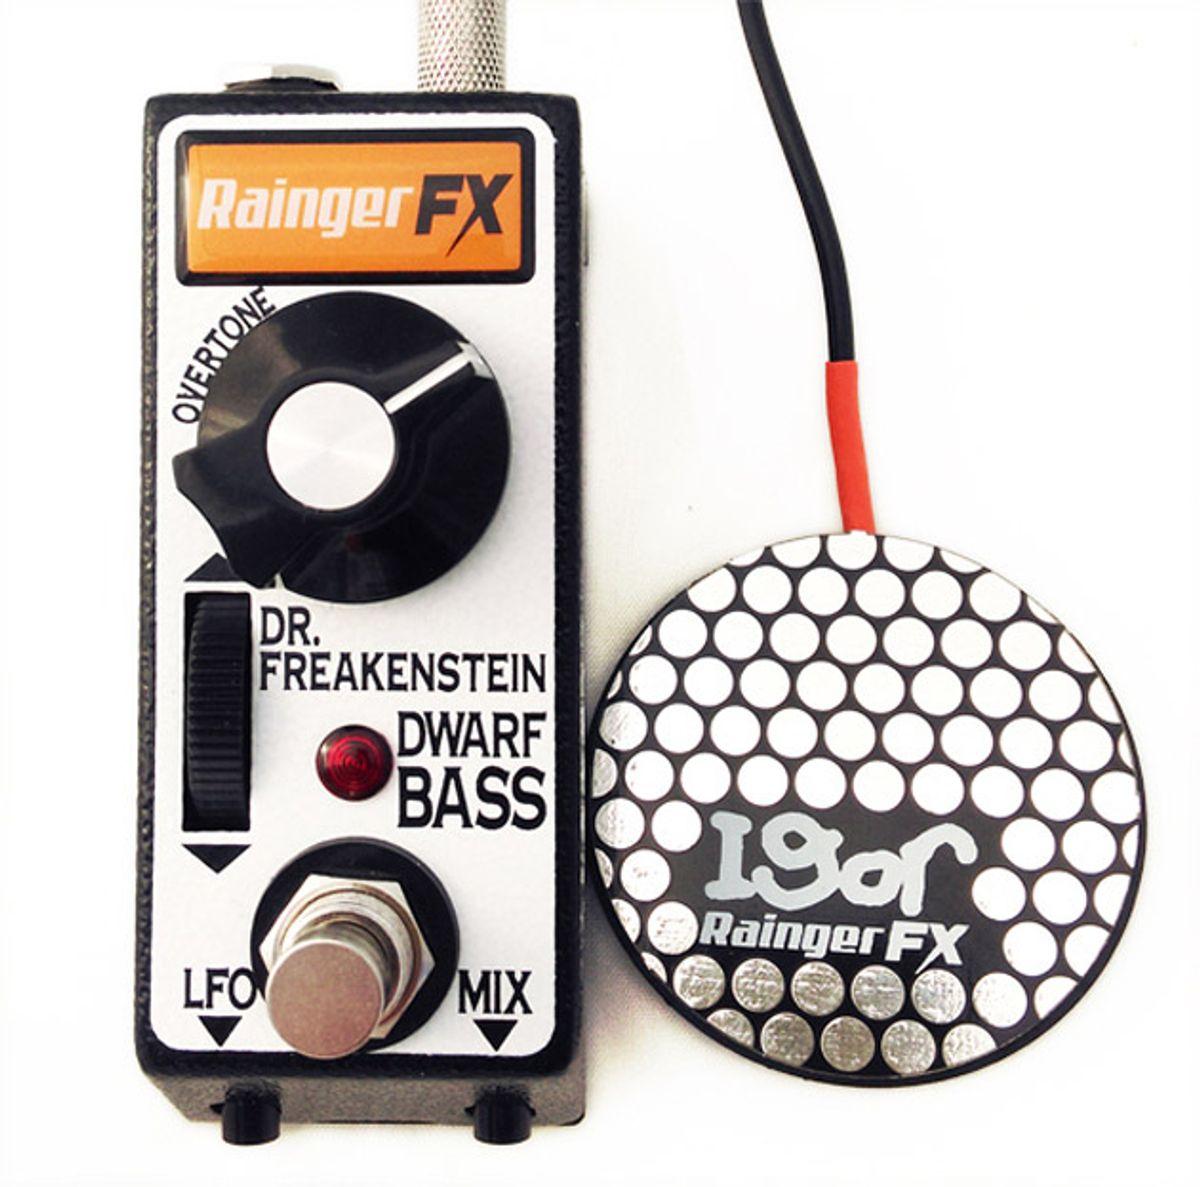 Quick Hit: Rainger FX Dr. Freakenstein Dwarf Bass Review